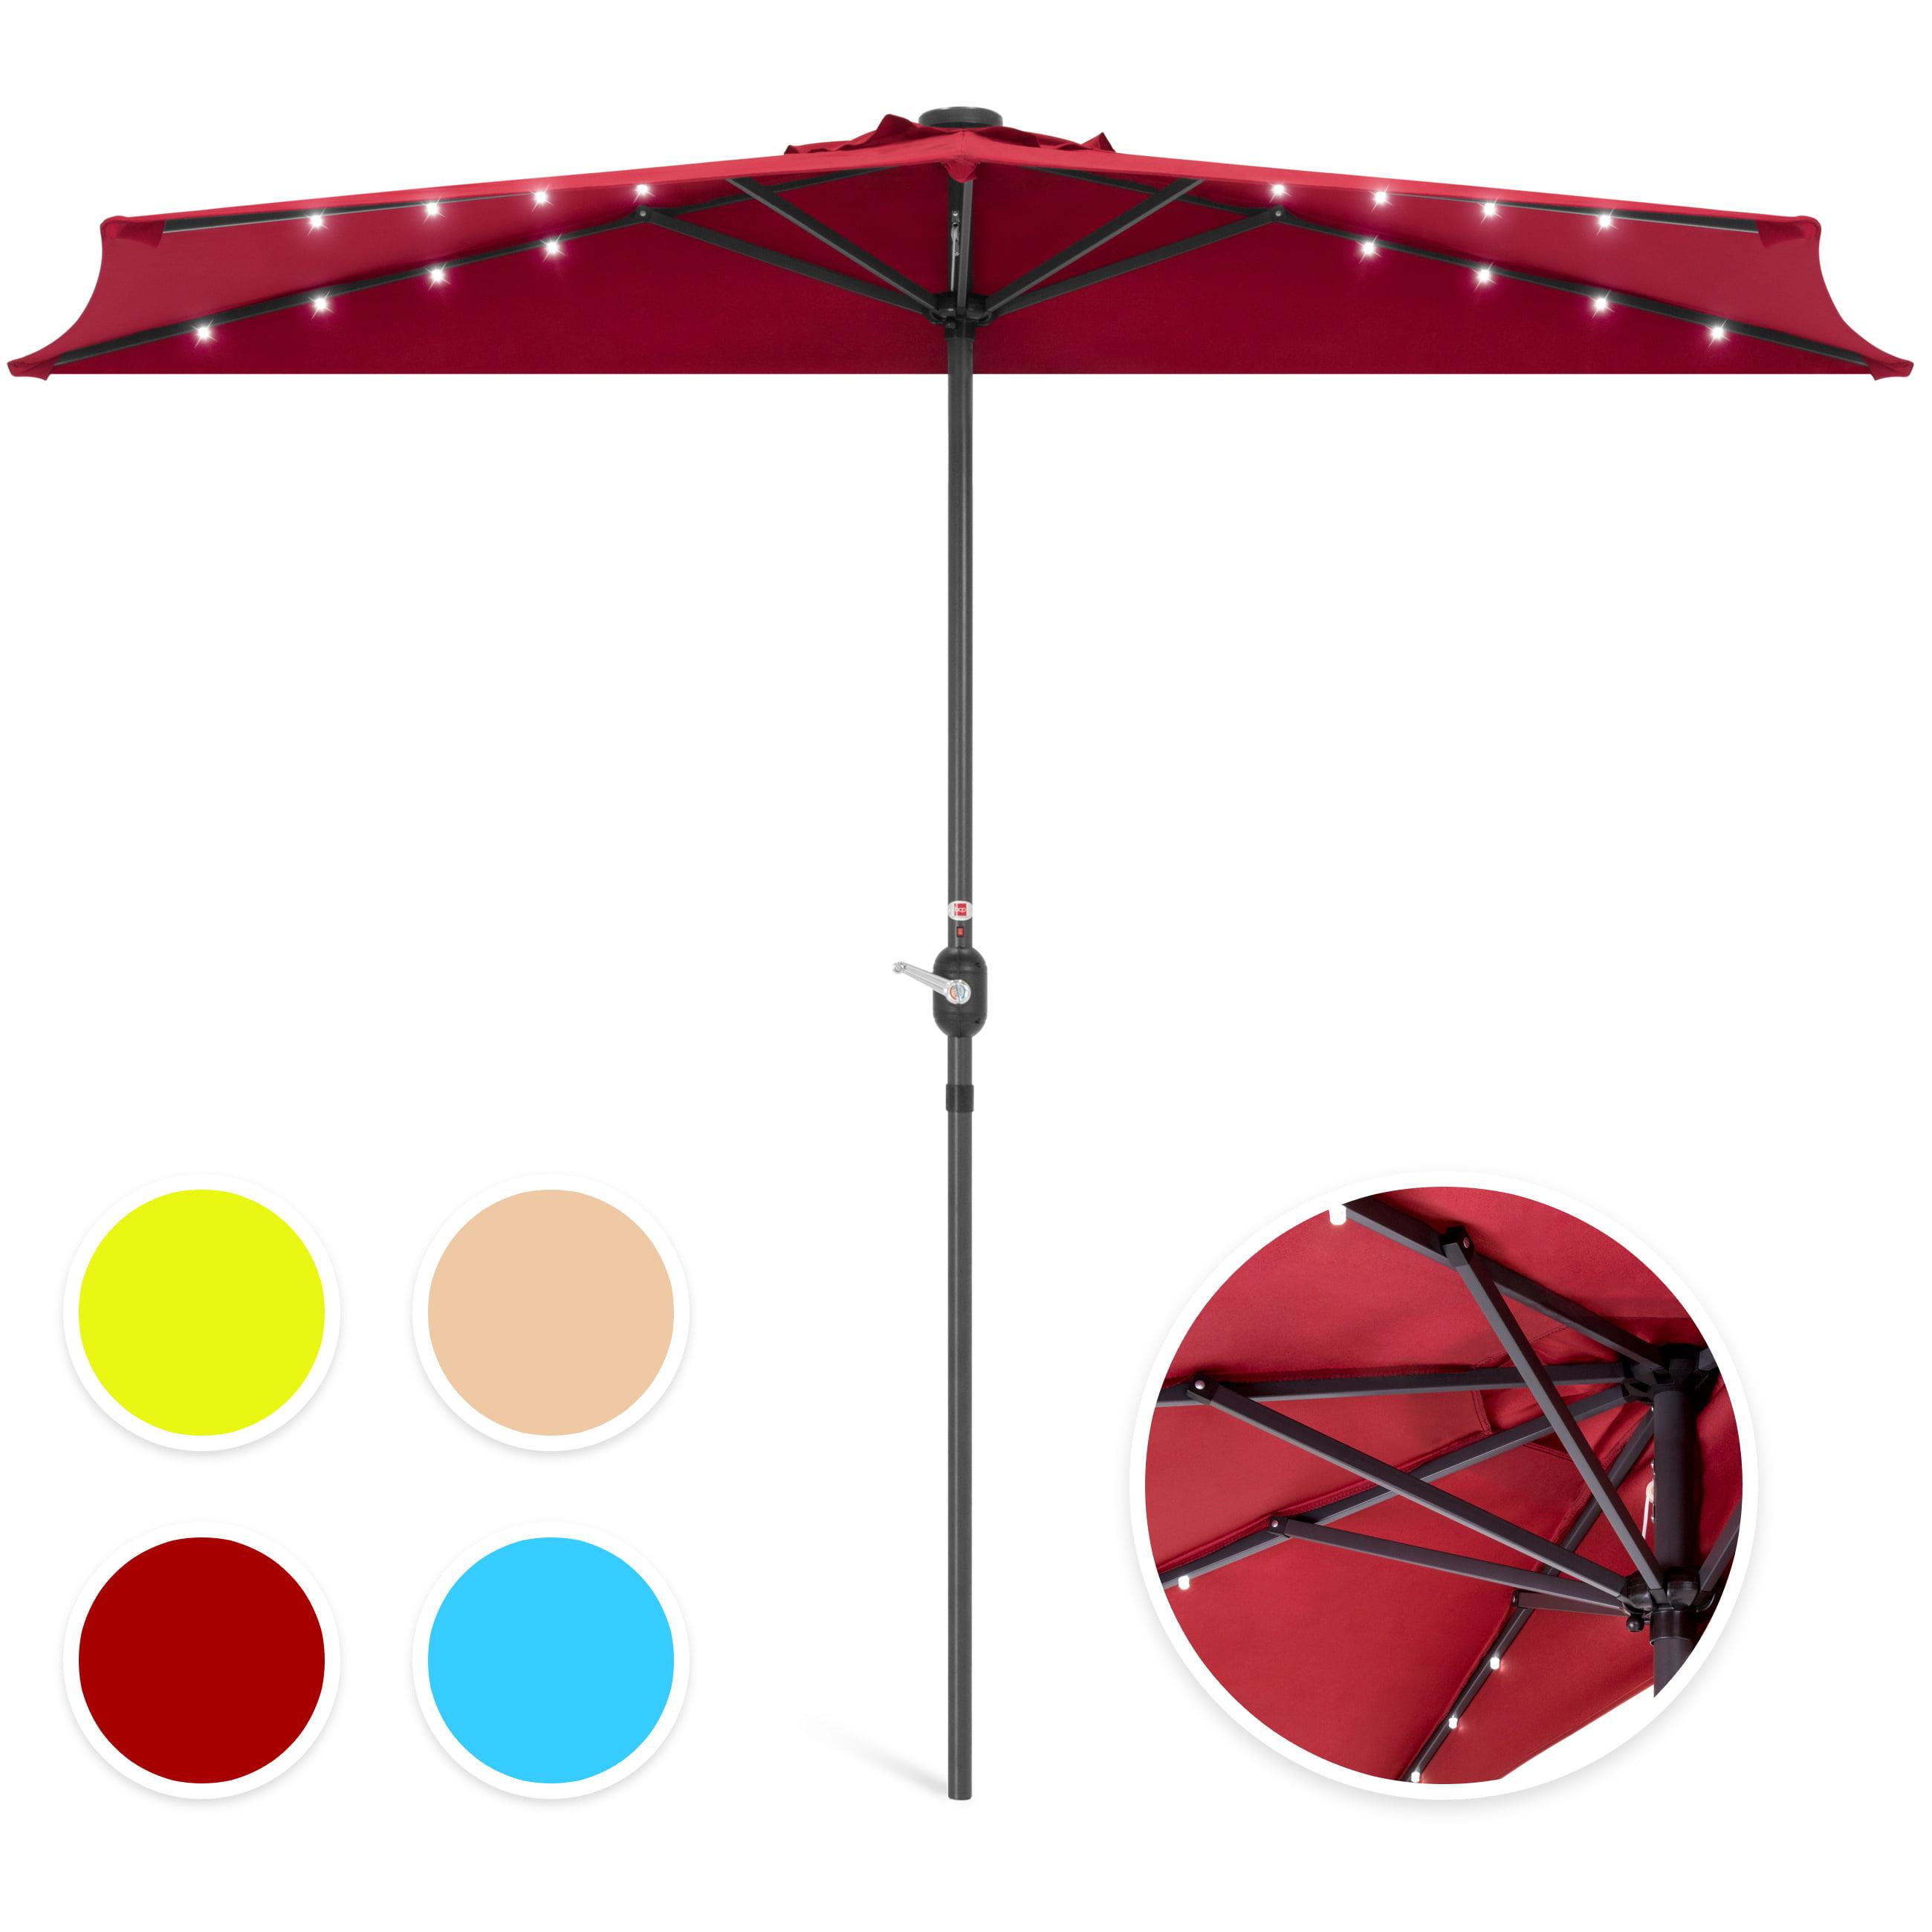 Best Choice Products 8.5ft Solar LED Half Patio Umbrella w/ Crank - Tan